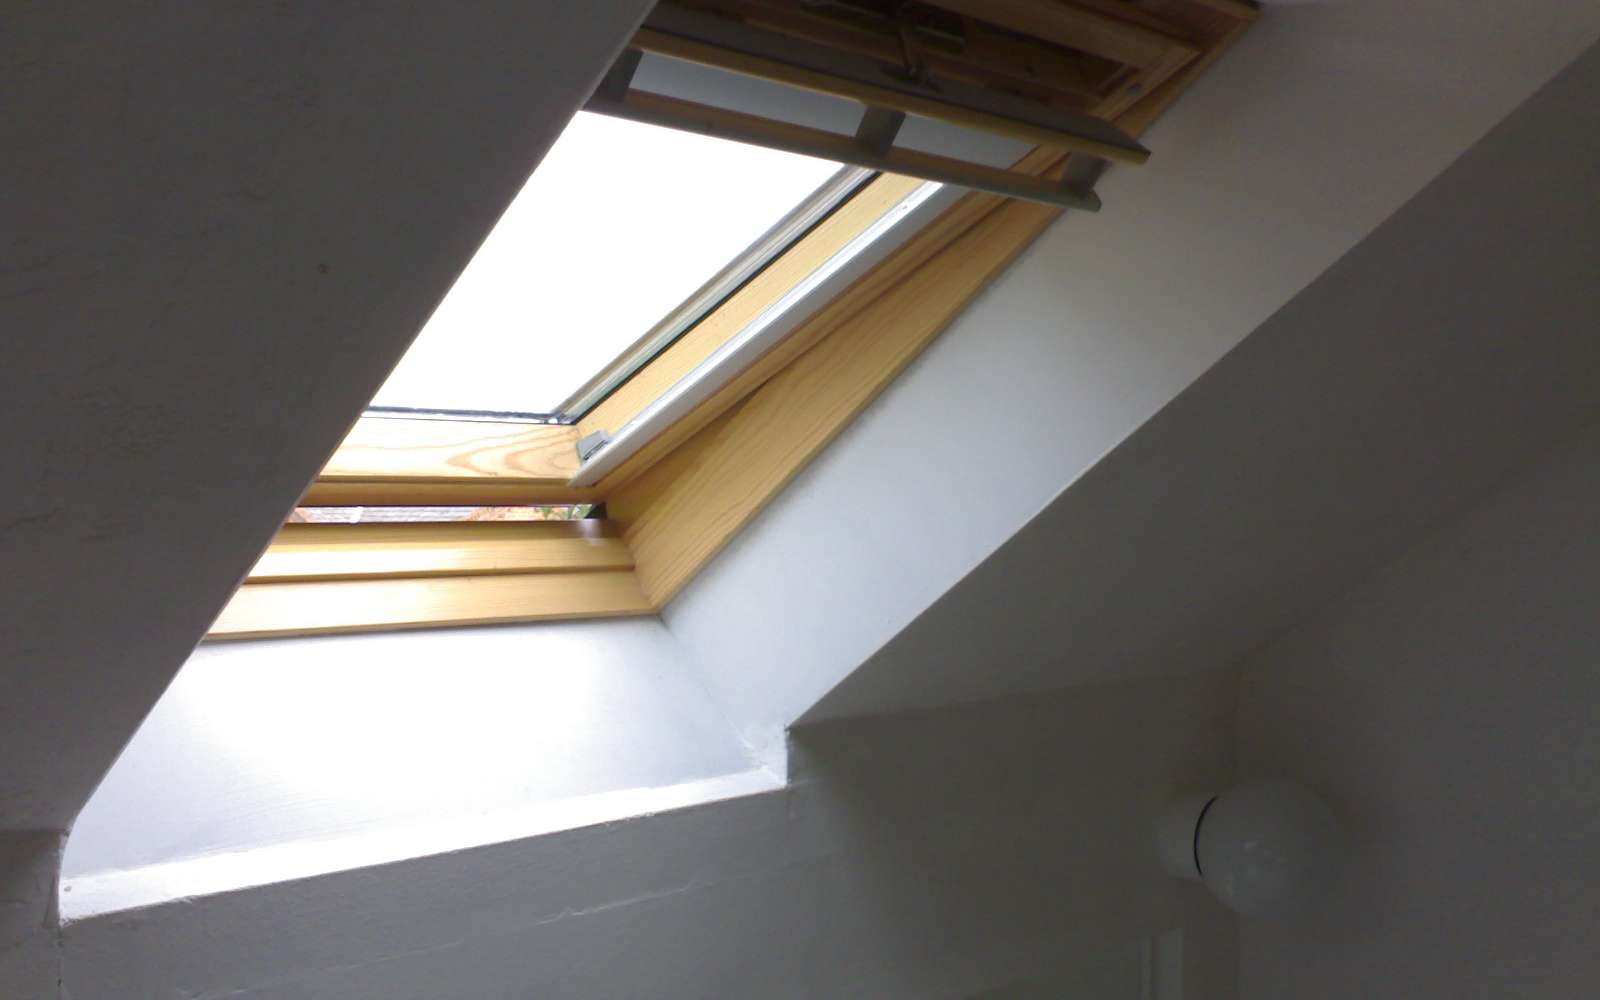 Fenêtre de toit, marque Velux® . © Robert Brook, CC BY 2.0, Wikimedia Commons